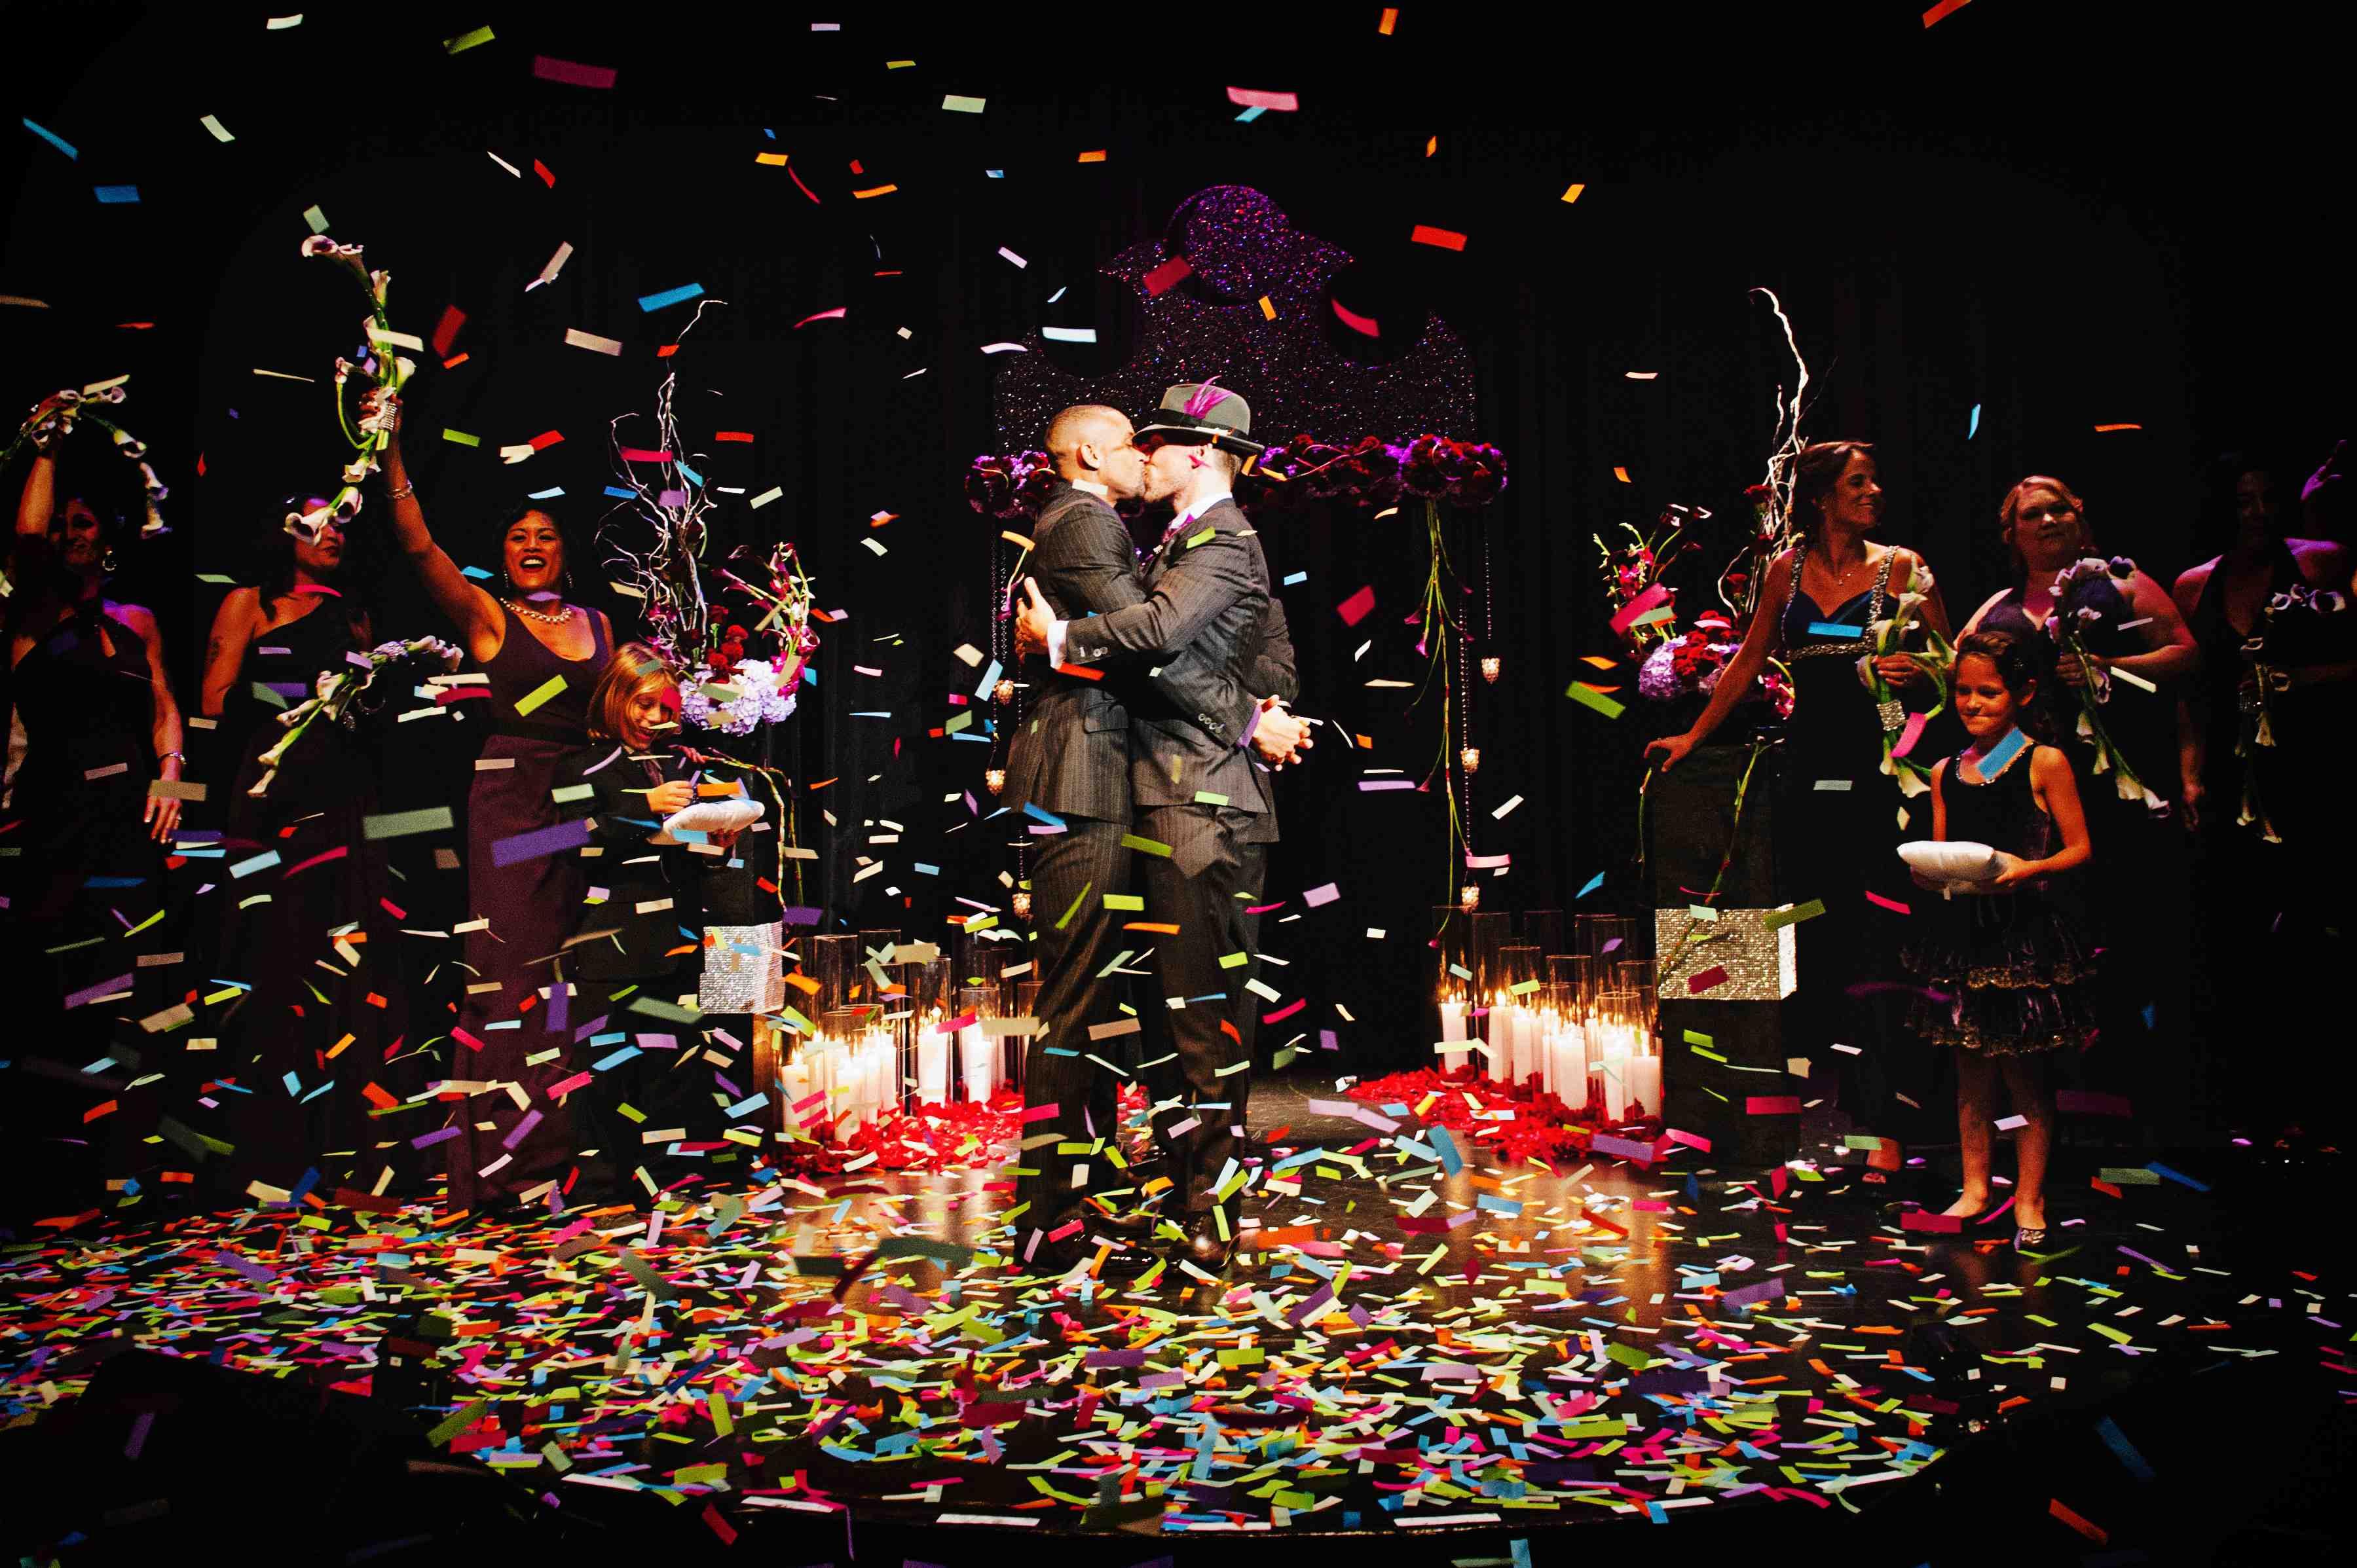 rainbow confetti at gay wedding as husbands kiss